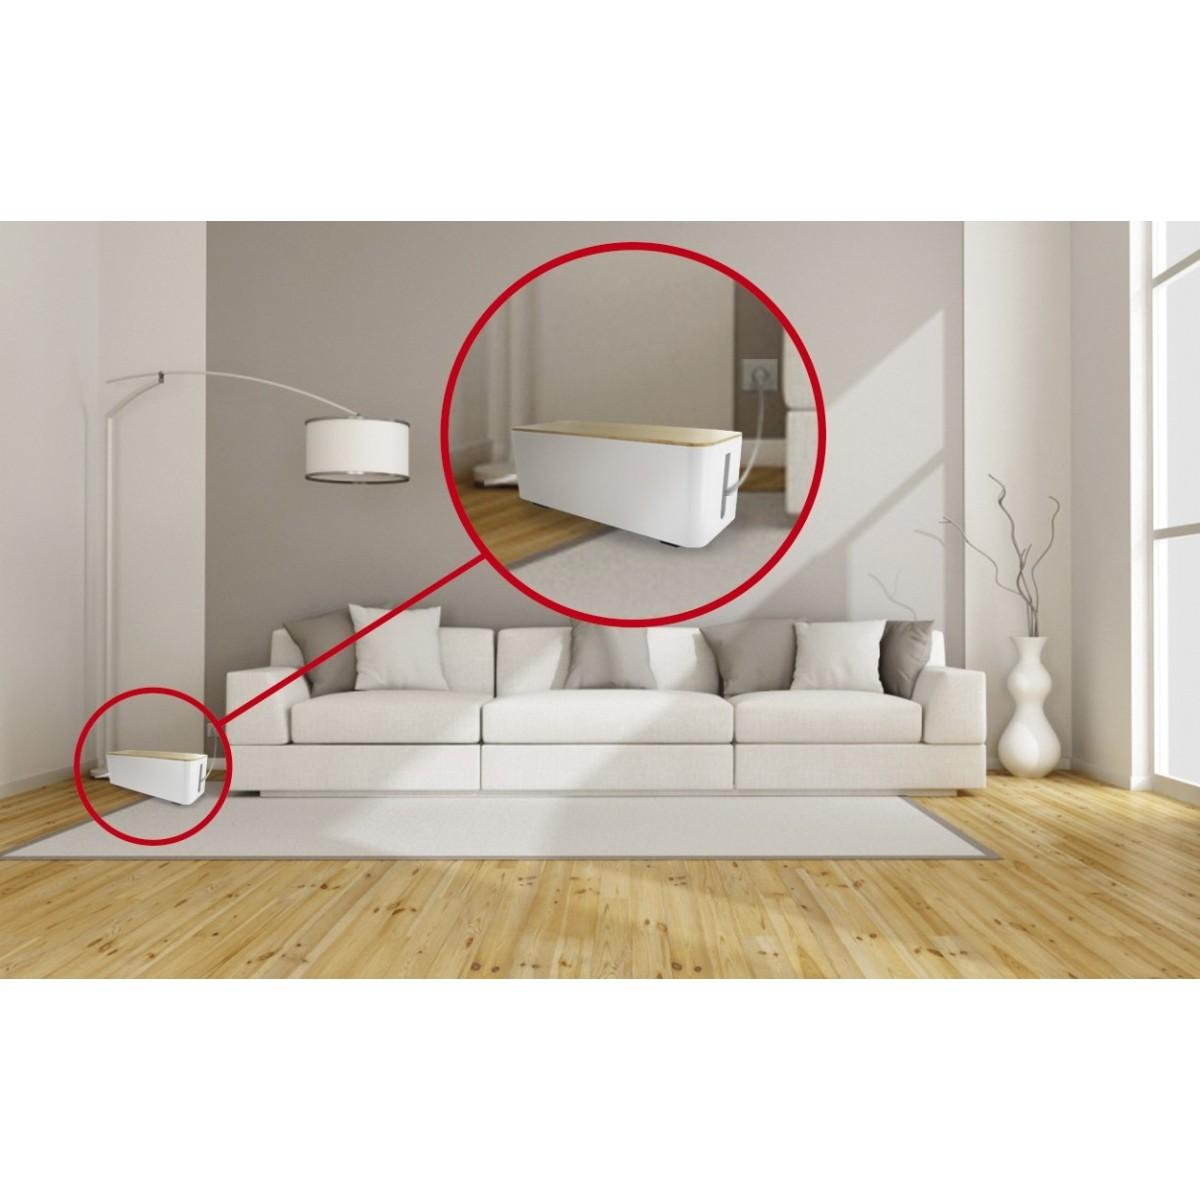 coffret de rangement c bles et multiprises grande taille. Black Bedroom Furniture Sets. Home Design Ideas